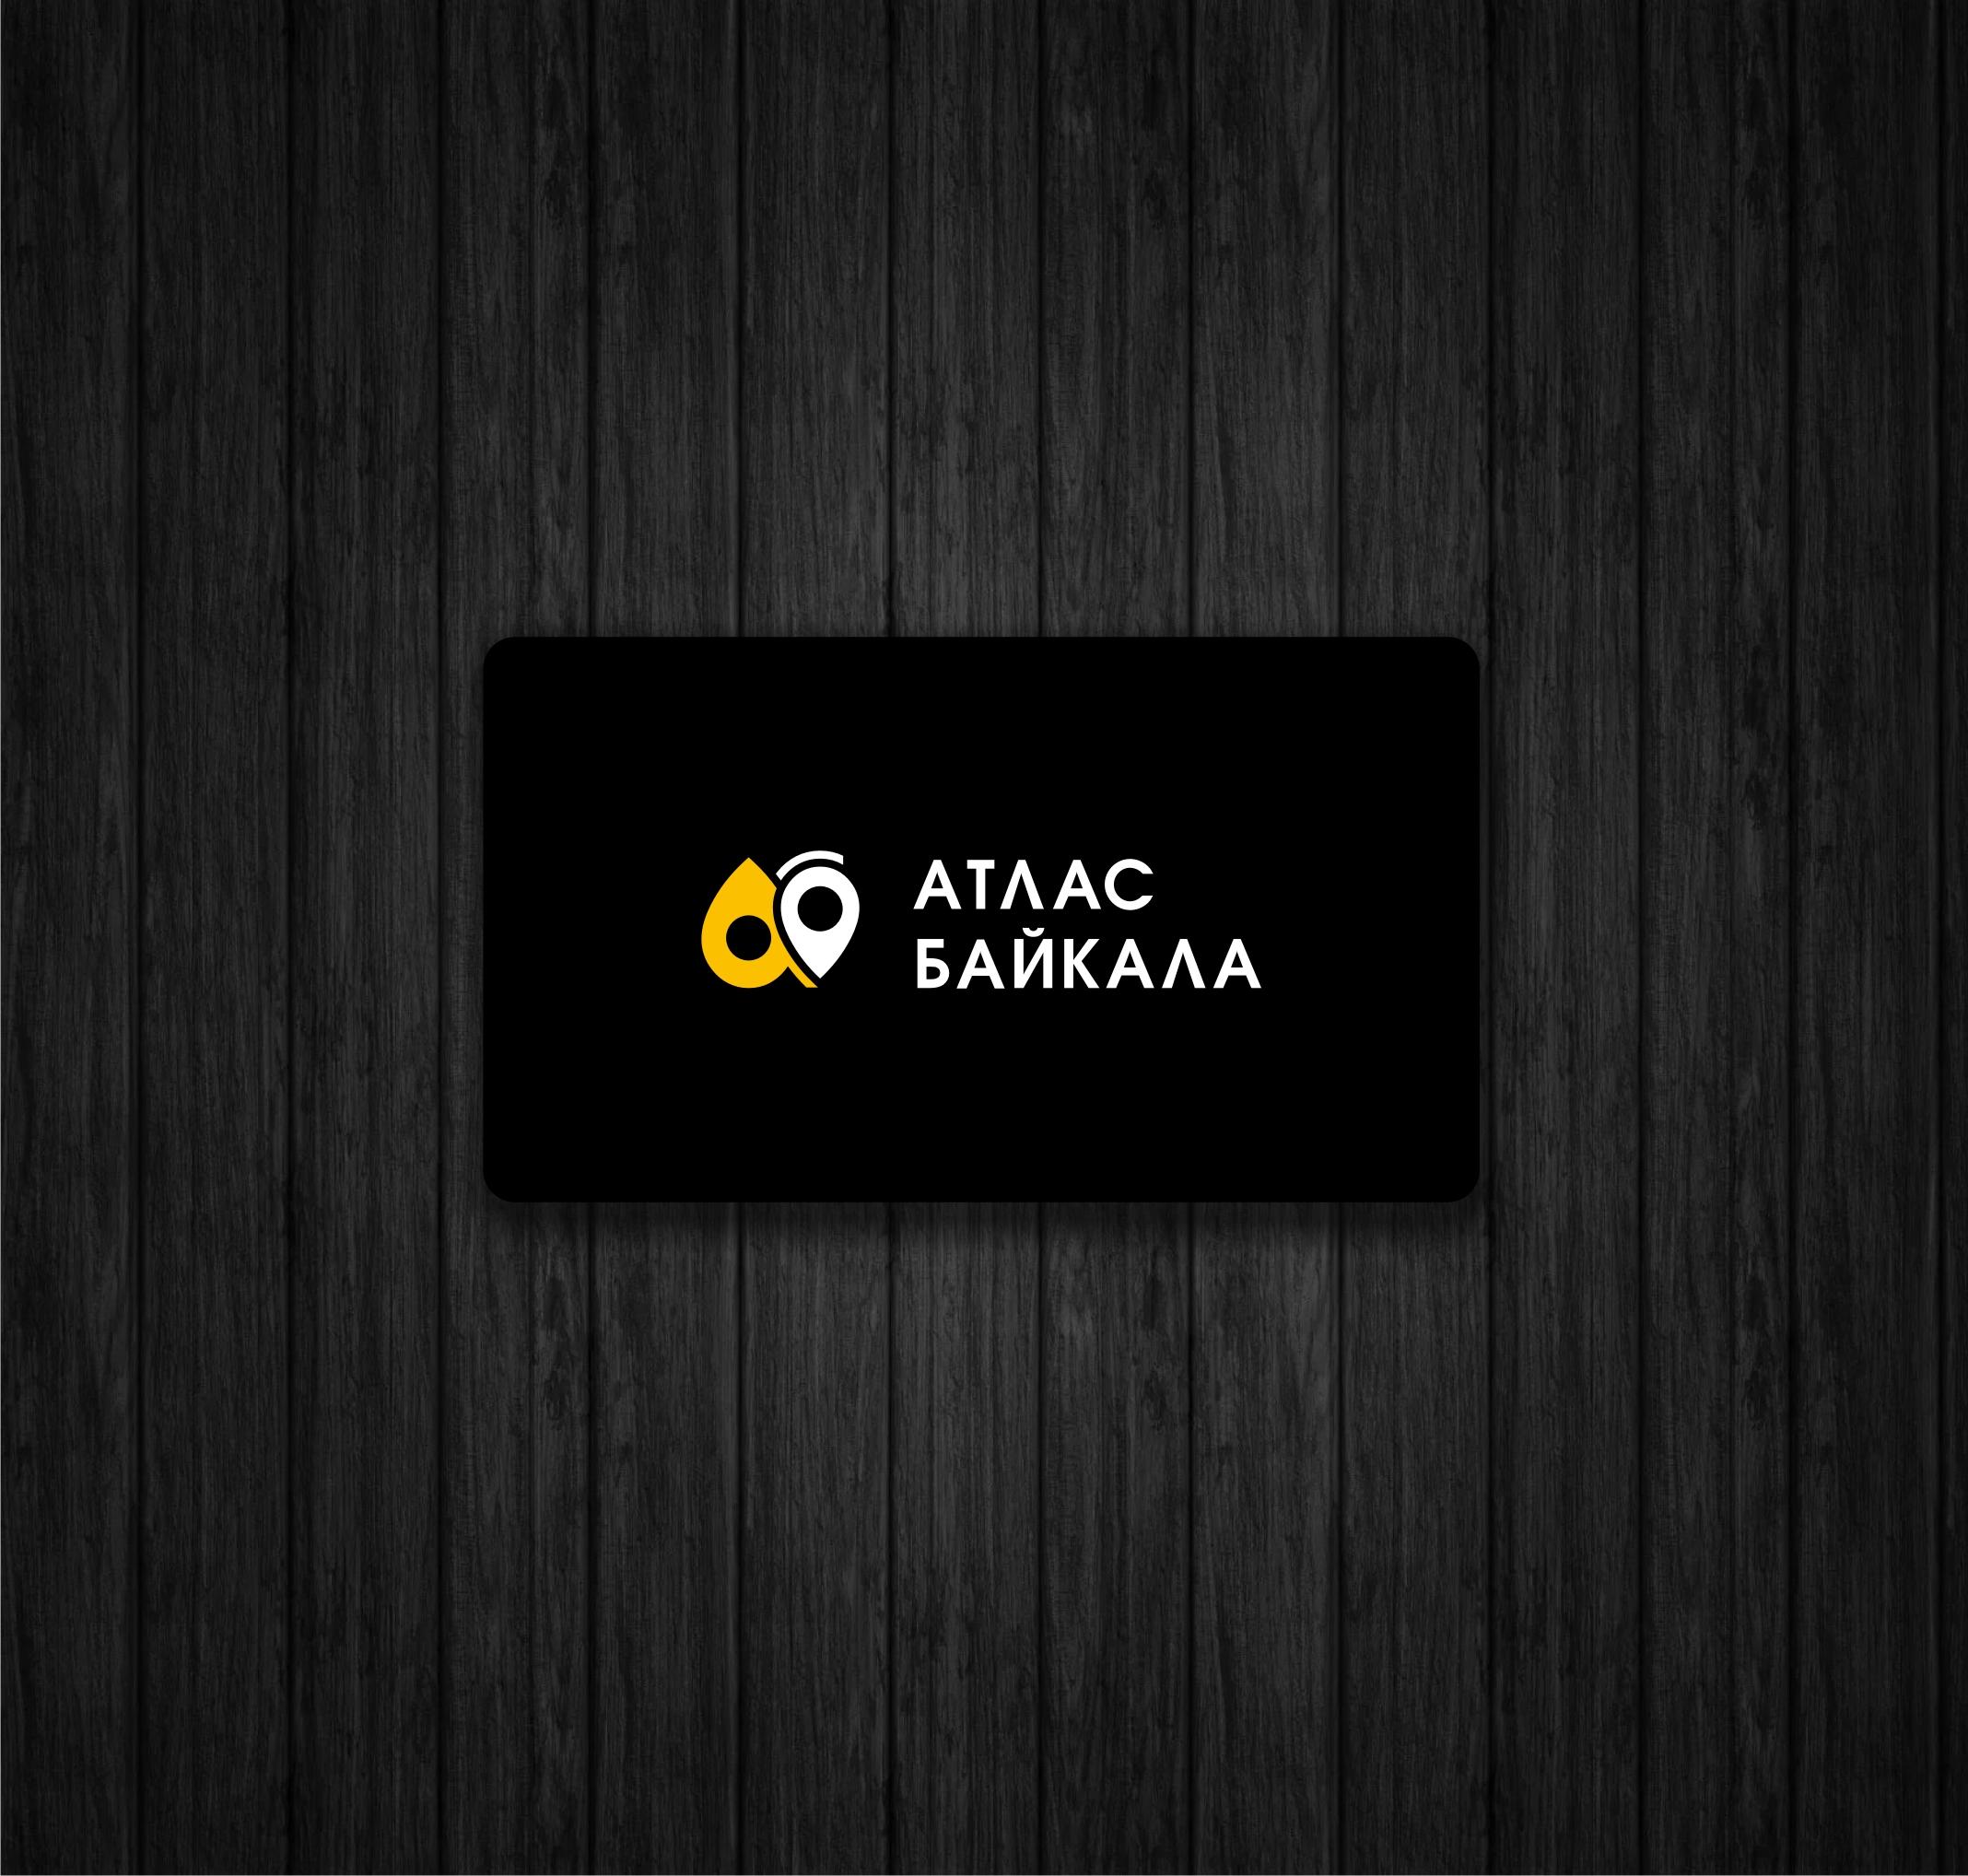 Разработка логотипа Атлас Байкала фото f_3435b16604528daf.jpg